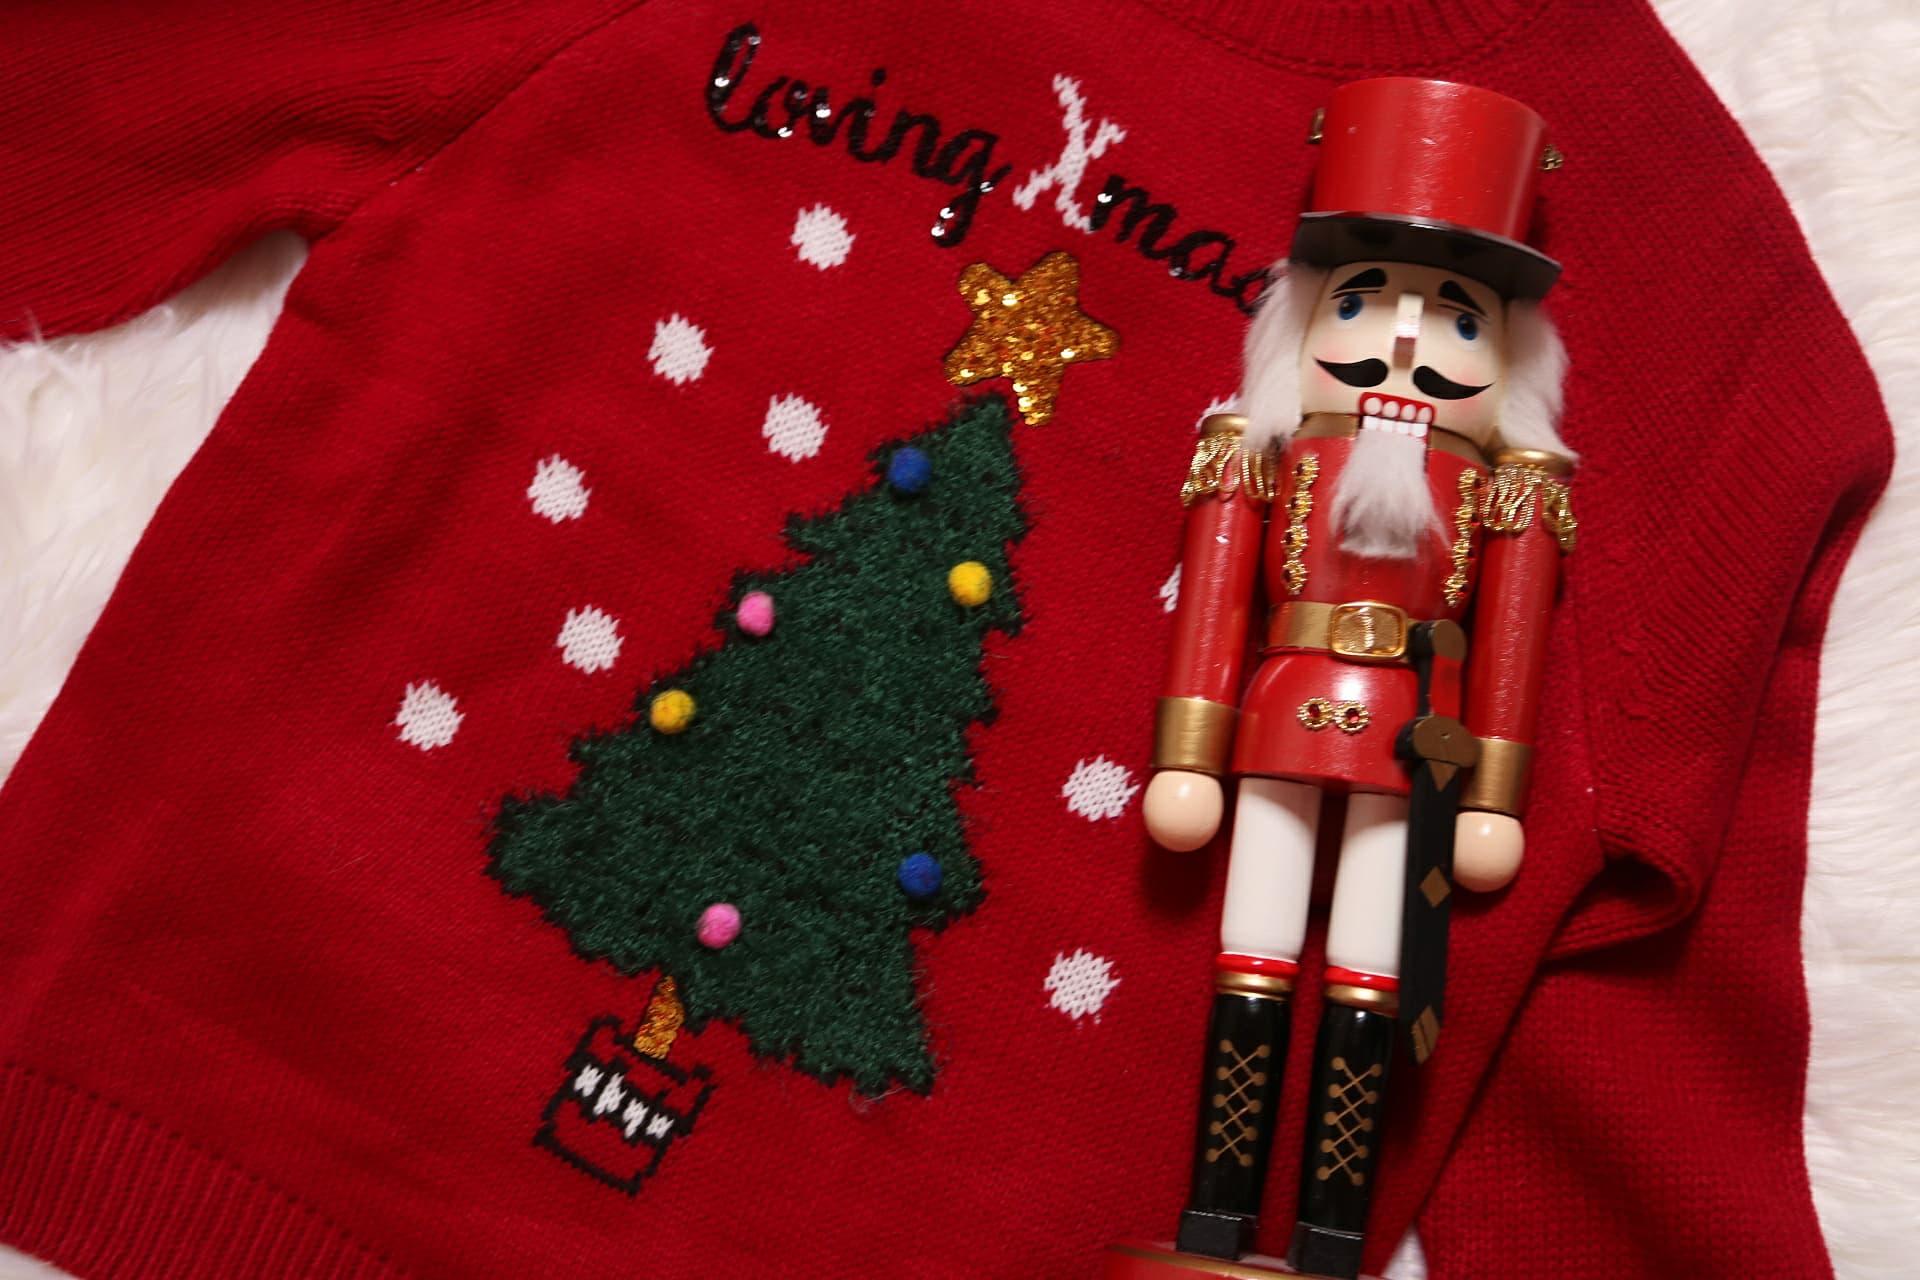 <a class=&quot;amazingslider-posttitle-link&quot; href=&quot;http://www.ahmagazin.com/konyvek/karacsonyi-ajandekotletek-lanyoknak/&quot; target=&quot;_self&quot;>Karácsonyi ajándékötletek lányoknak</a>